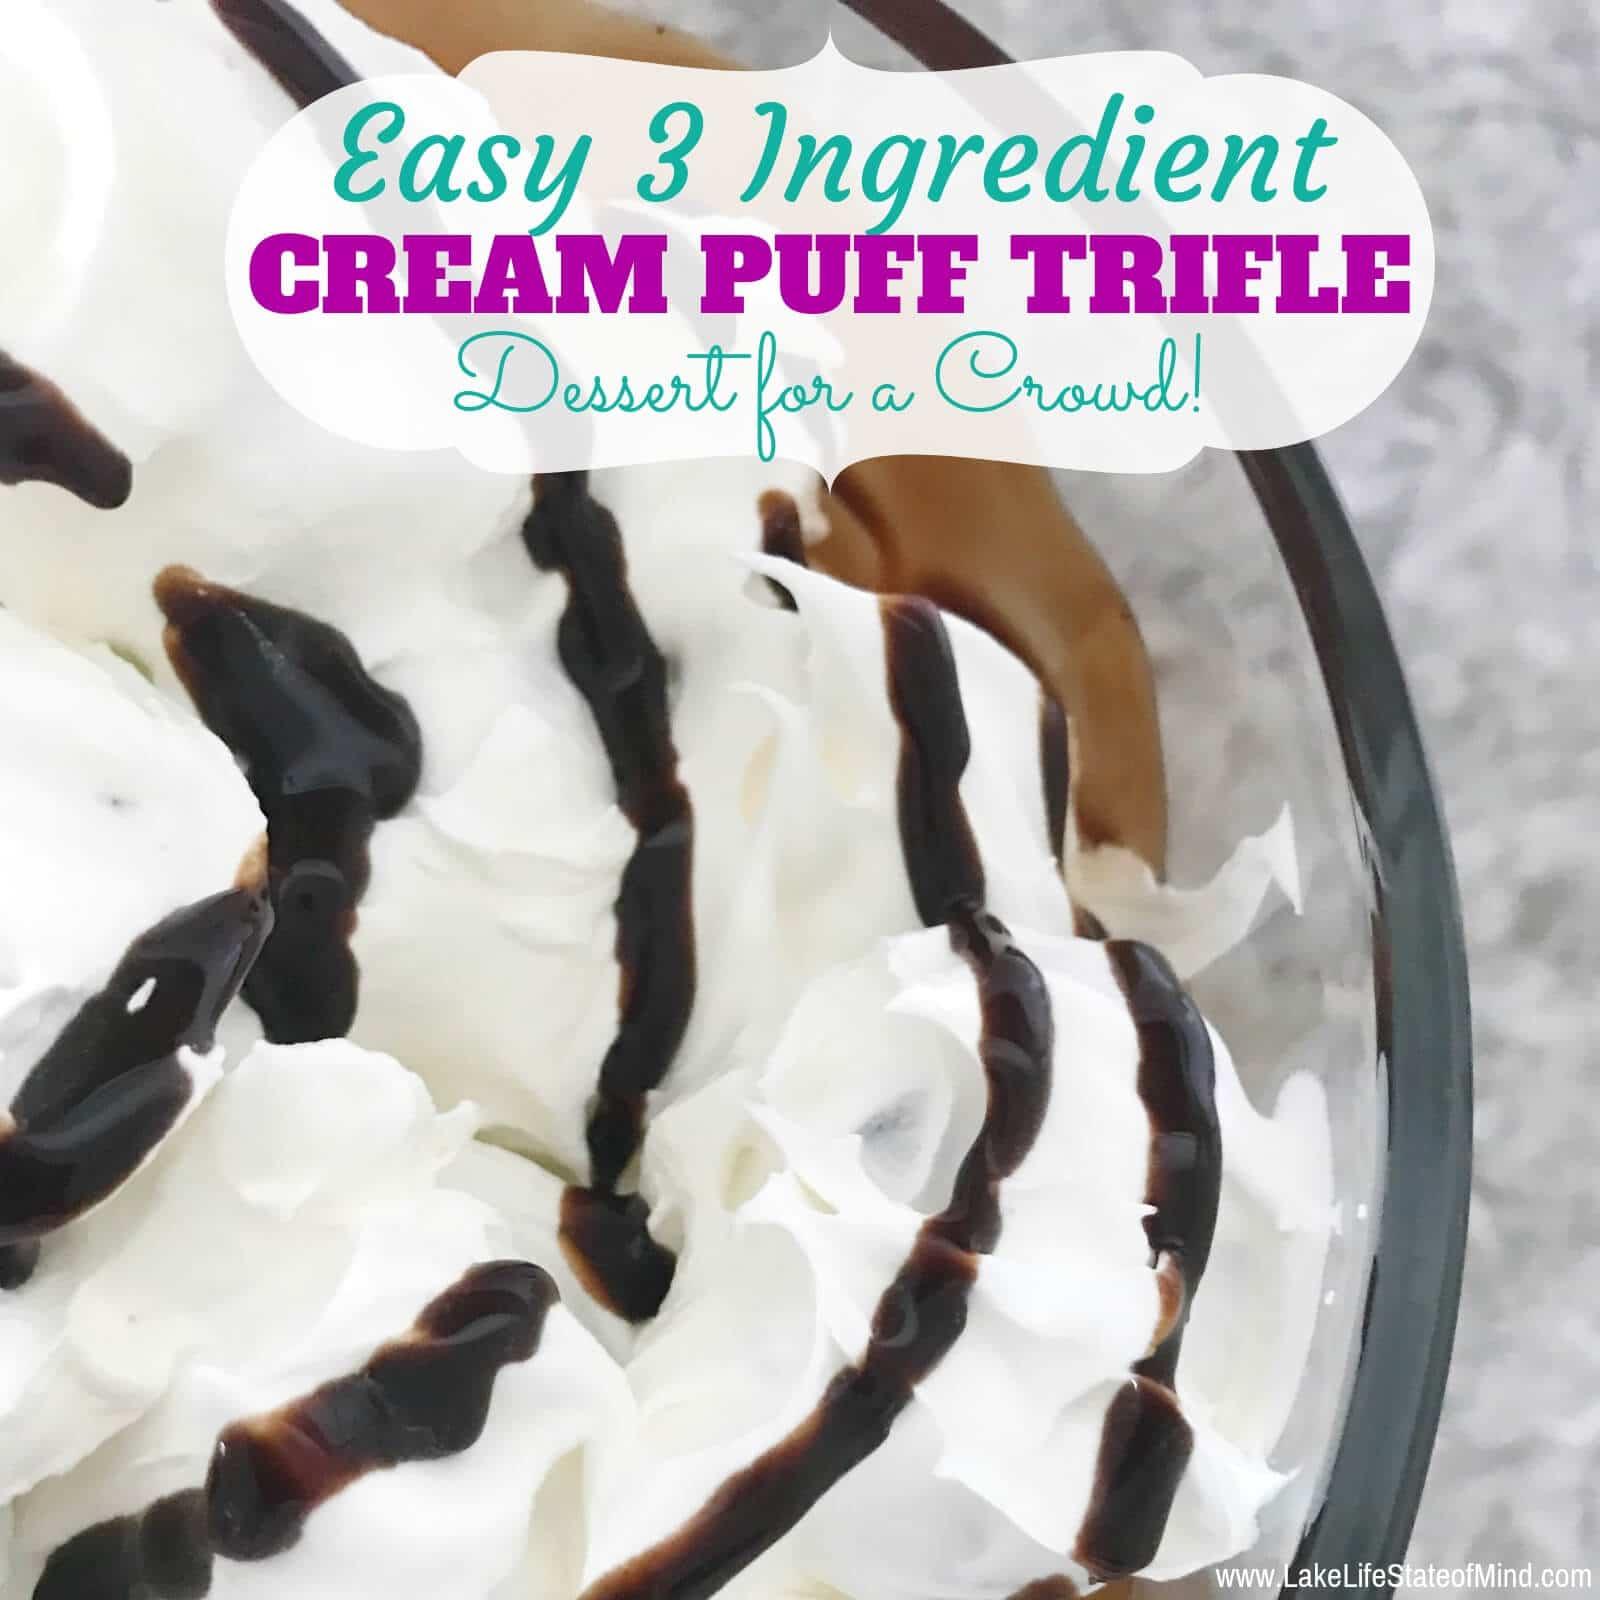 Easy 3 Ingredient Cream Puff Trifle